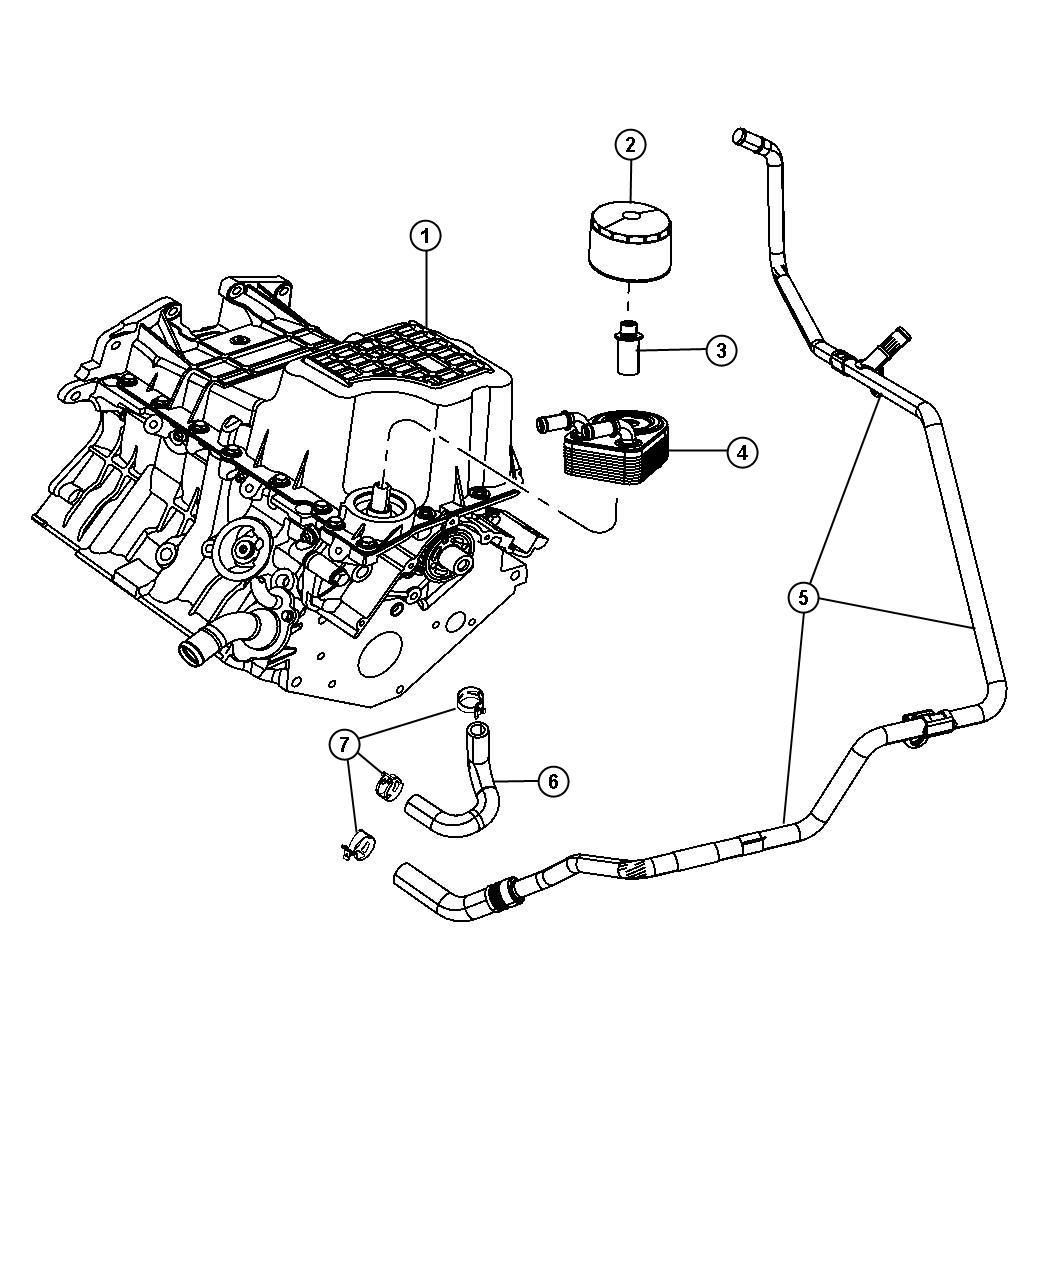 Engine Oil Cooler, Oil Filter And Coolant Tubes 4.0L [EGQ]